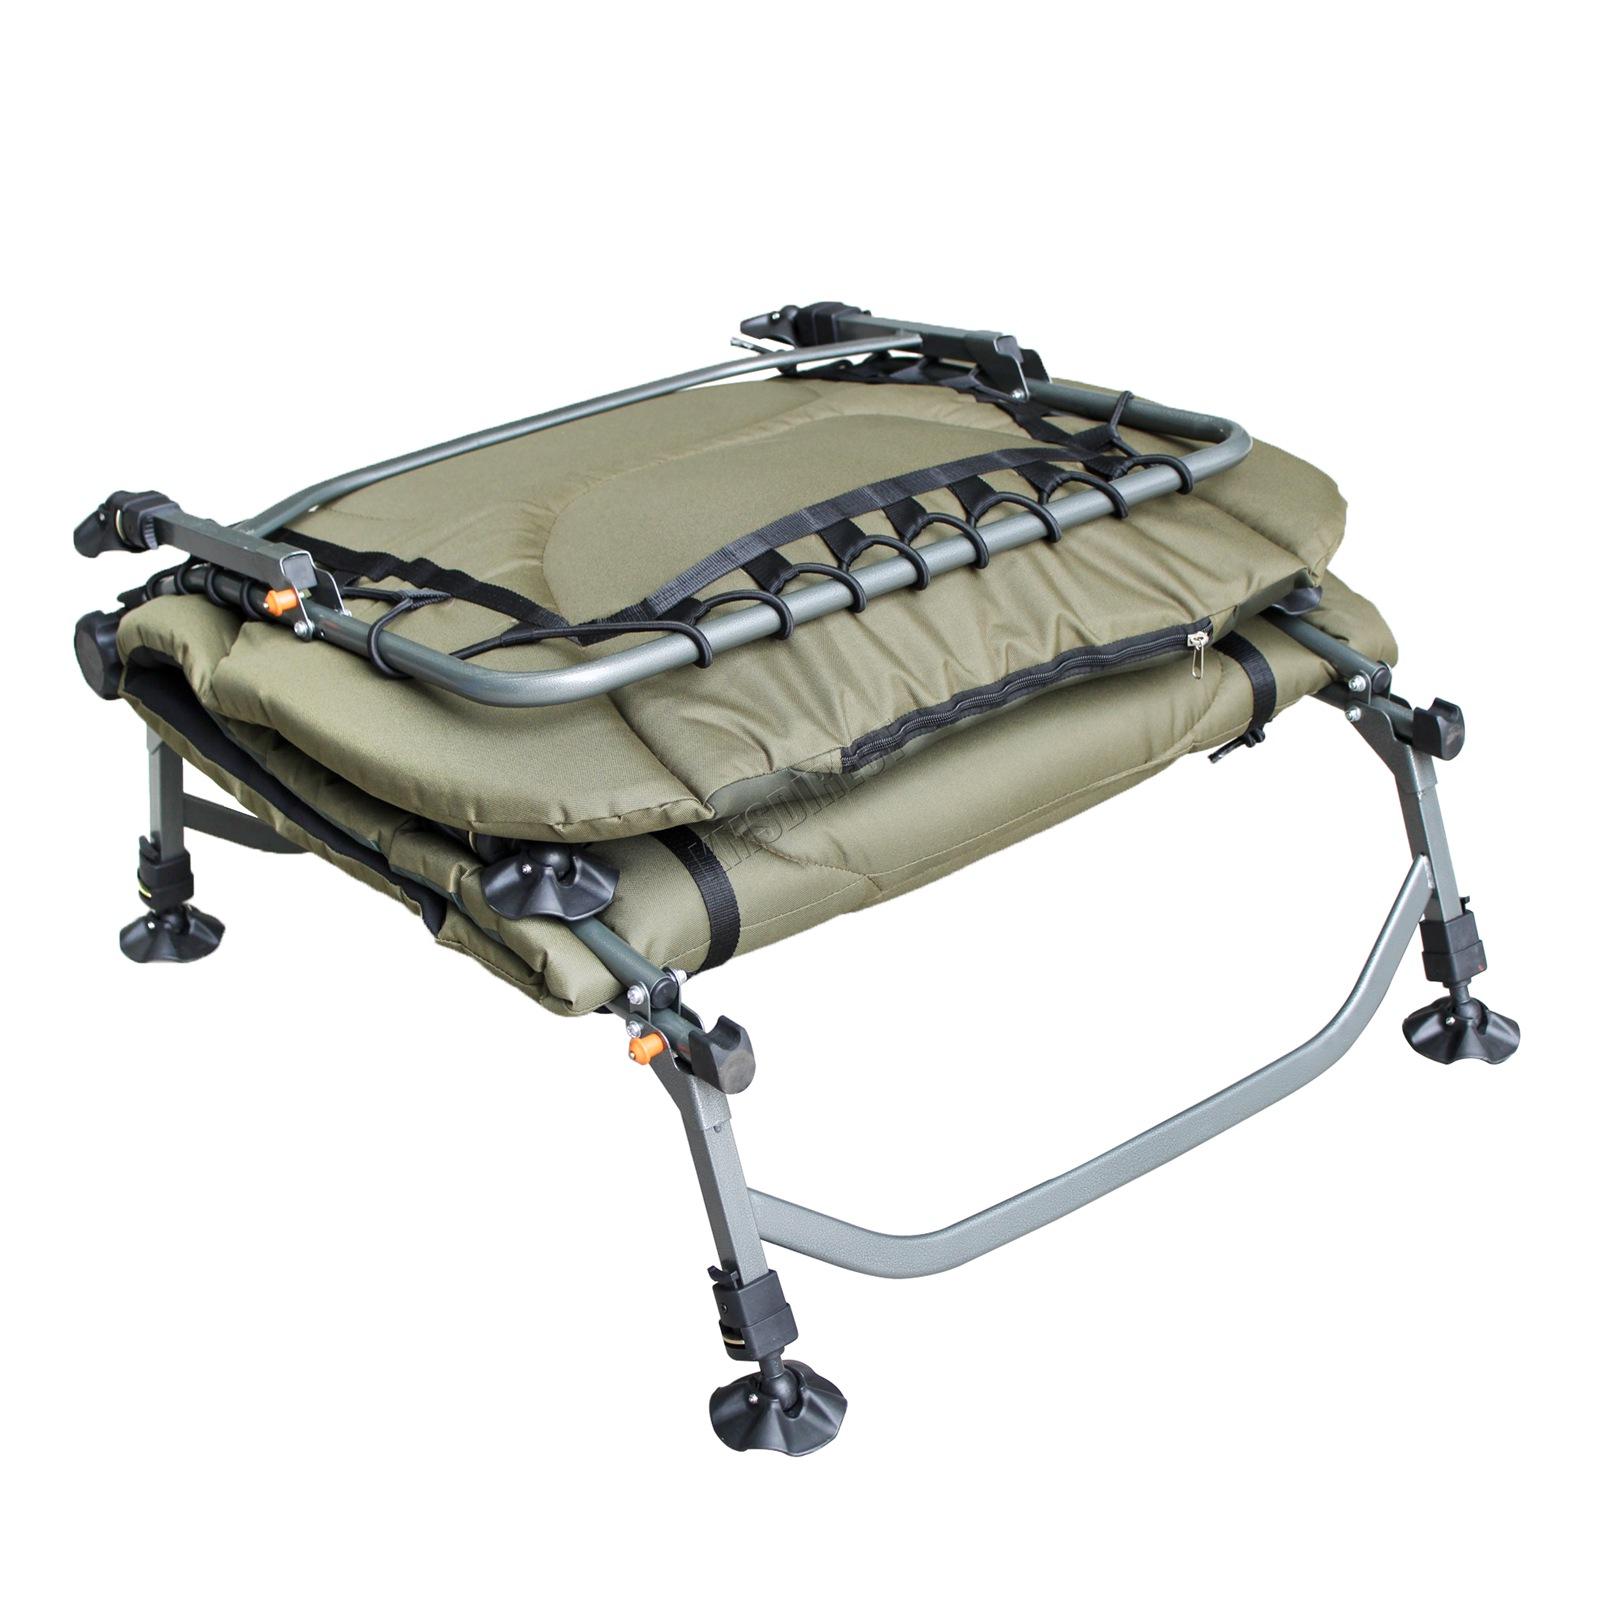 Carp Fishing Bed Chair Bedchair Camping Heavy Duty 8